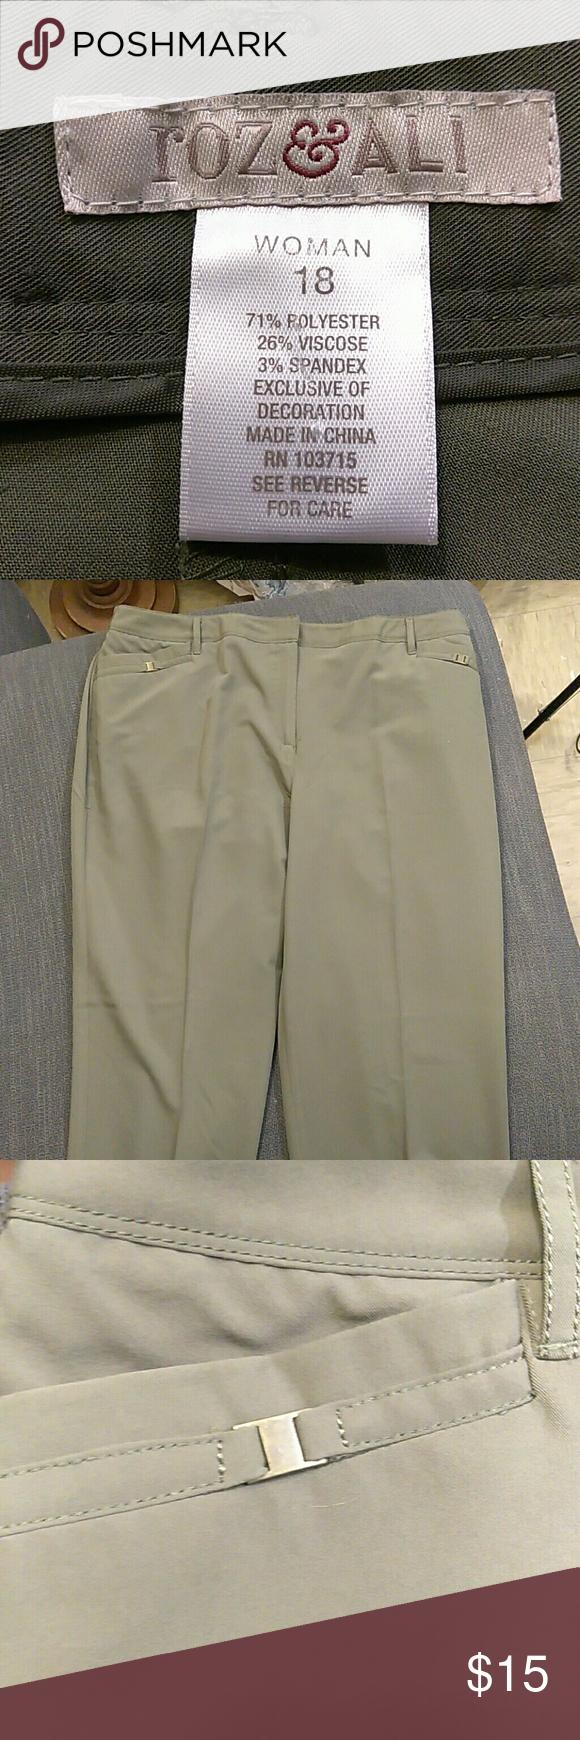 Dress pants trousers roz u al womans plus size dress pants